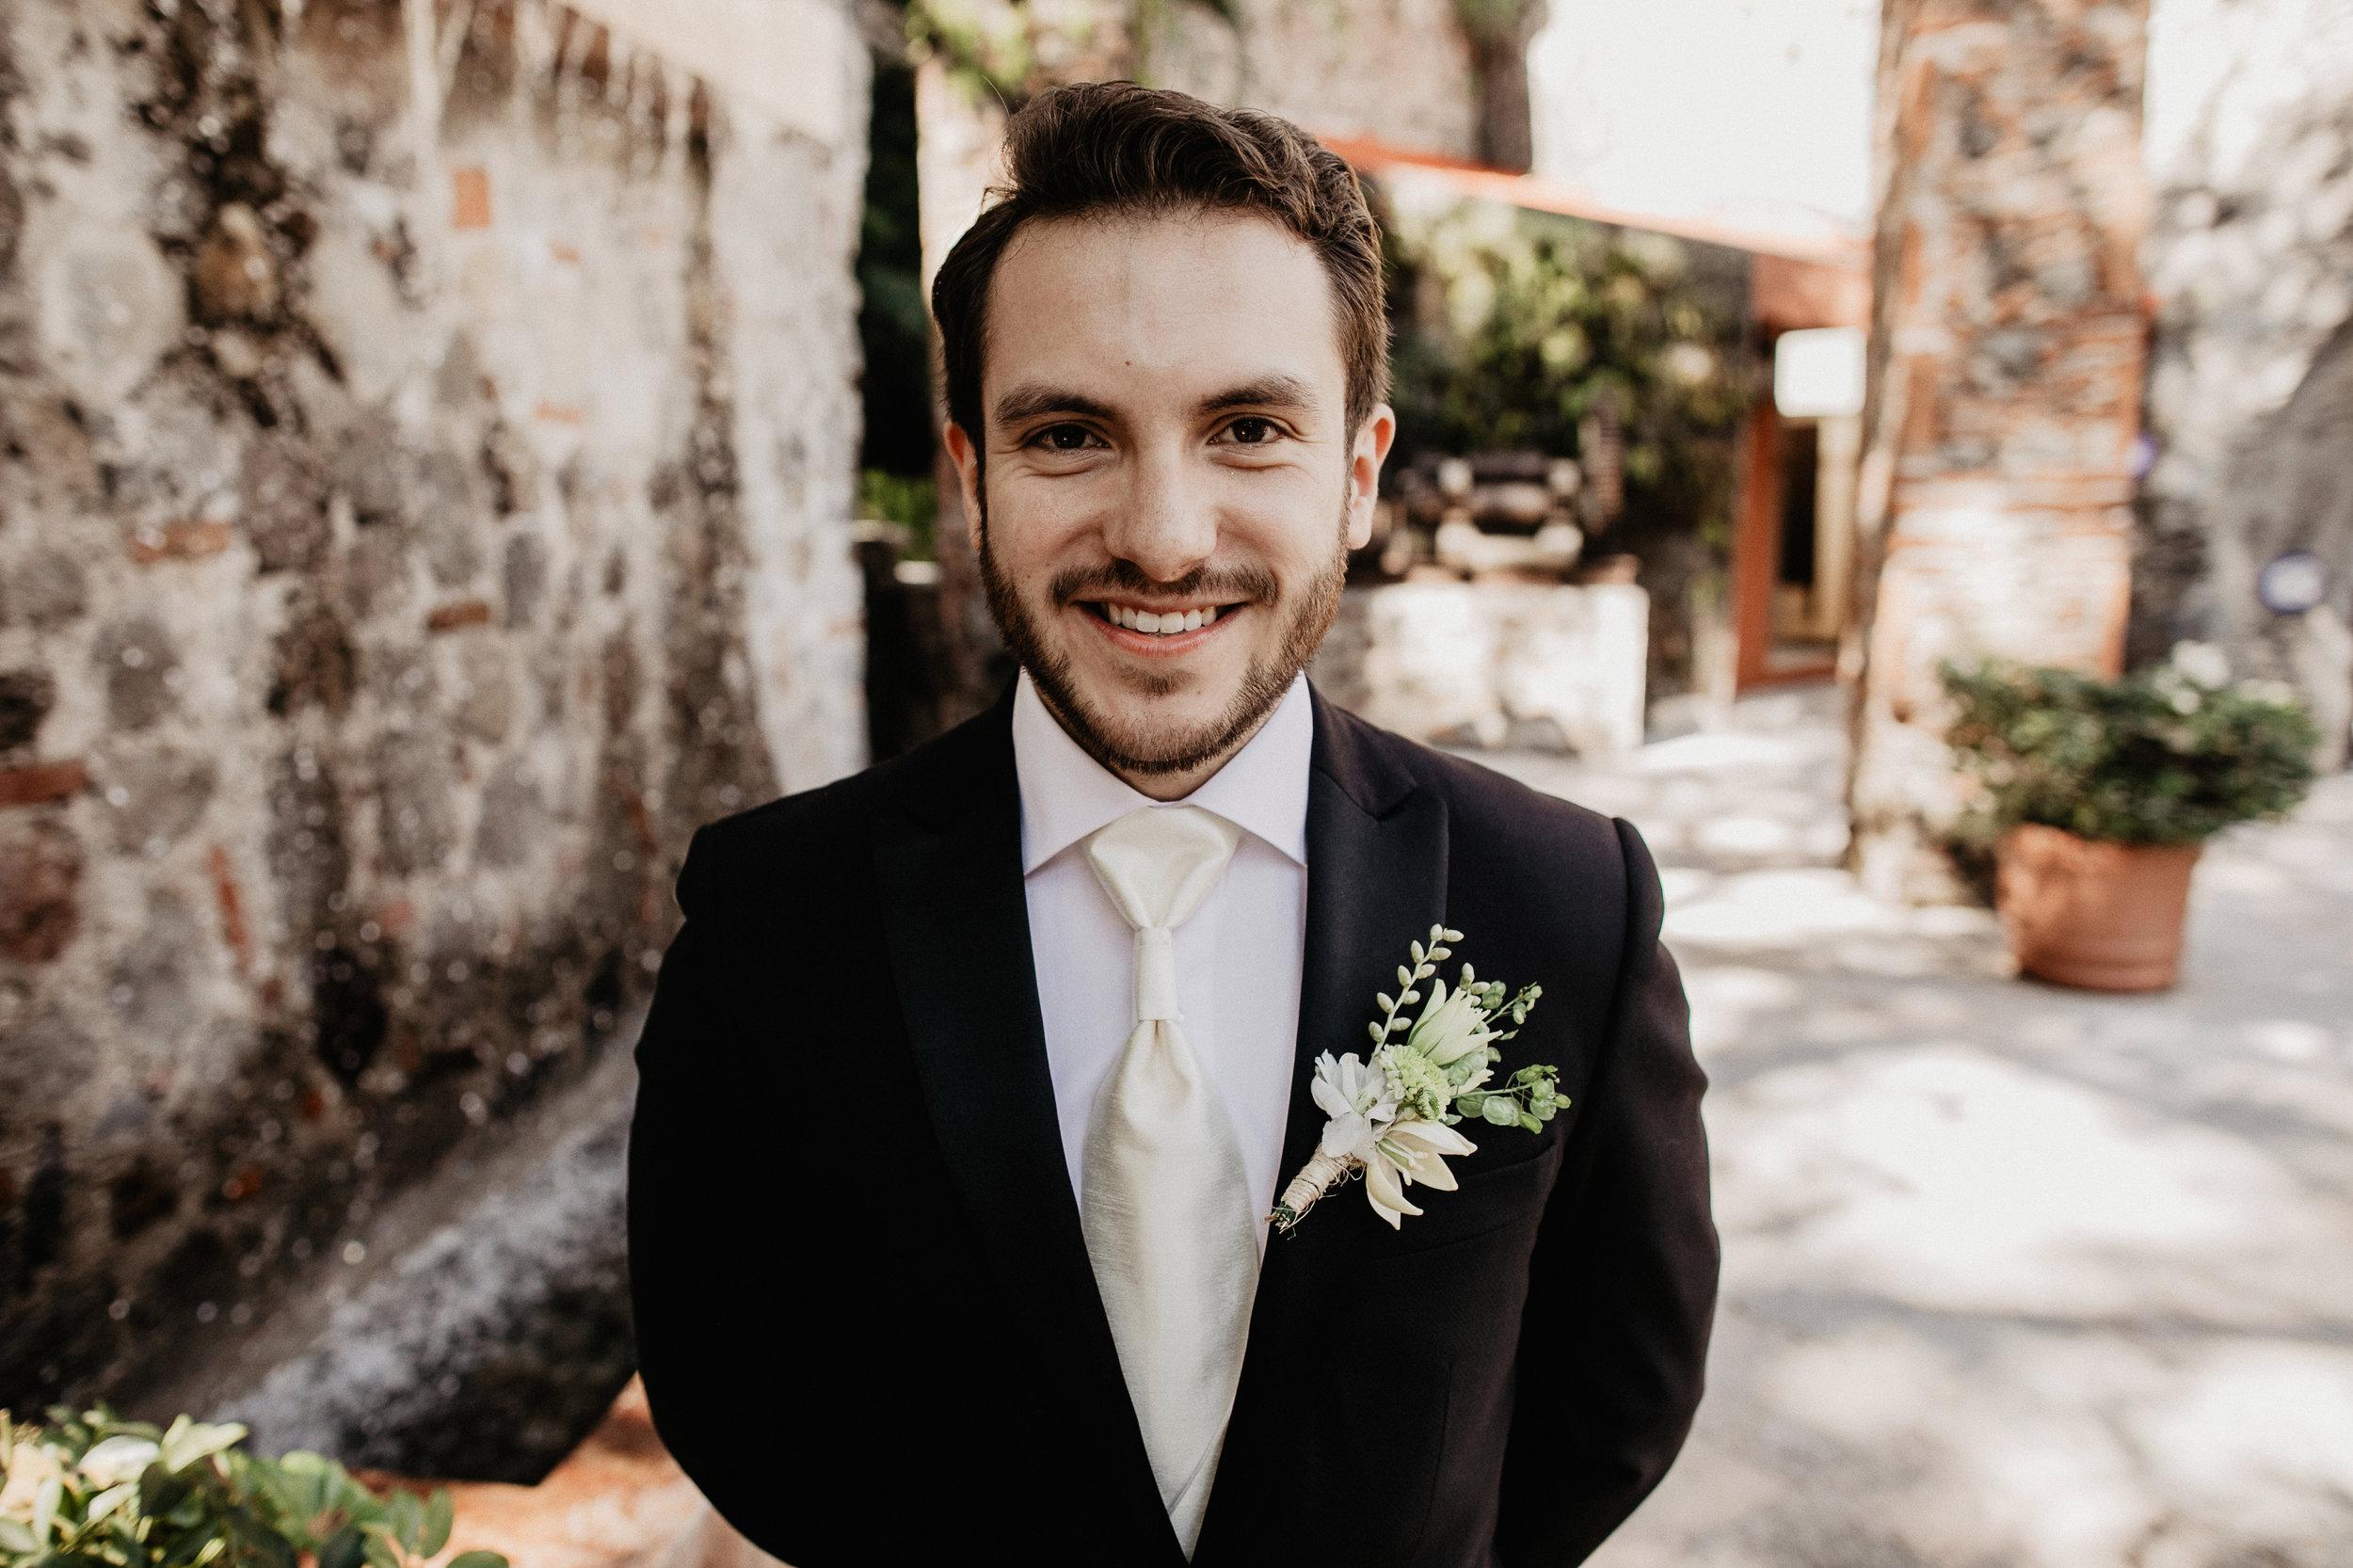 Alfonso_flores_destination_wedding_photography_vanesa_carlos-264.JPG